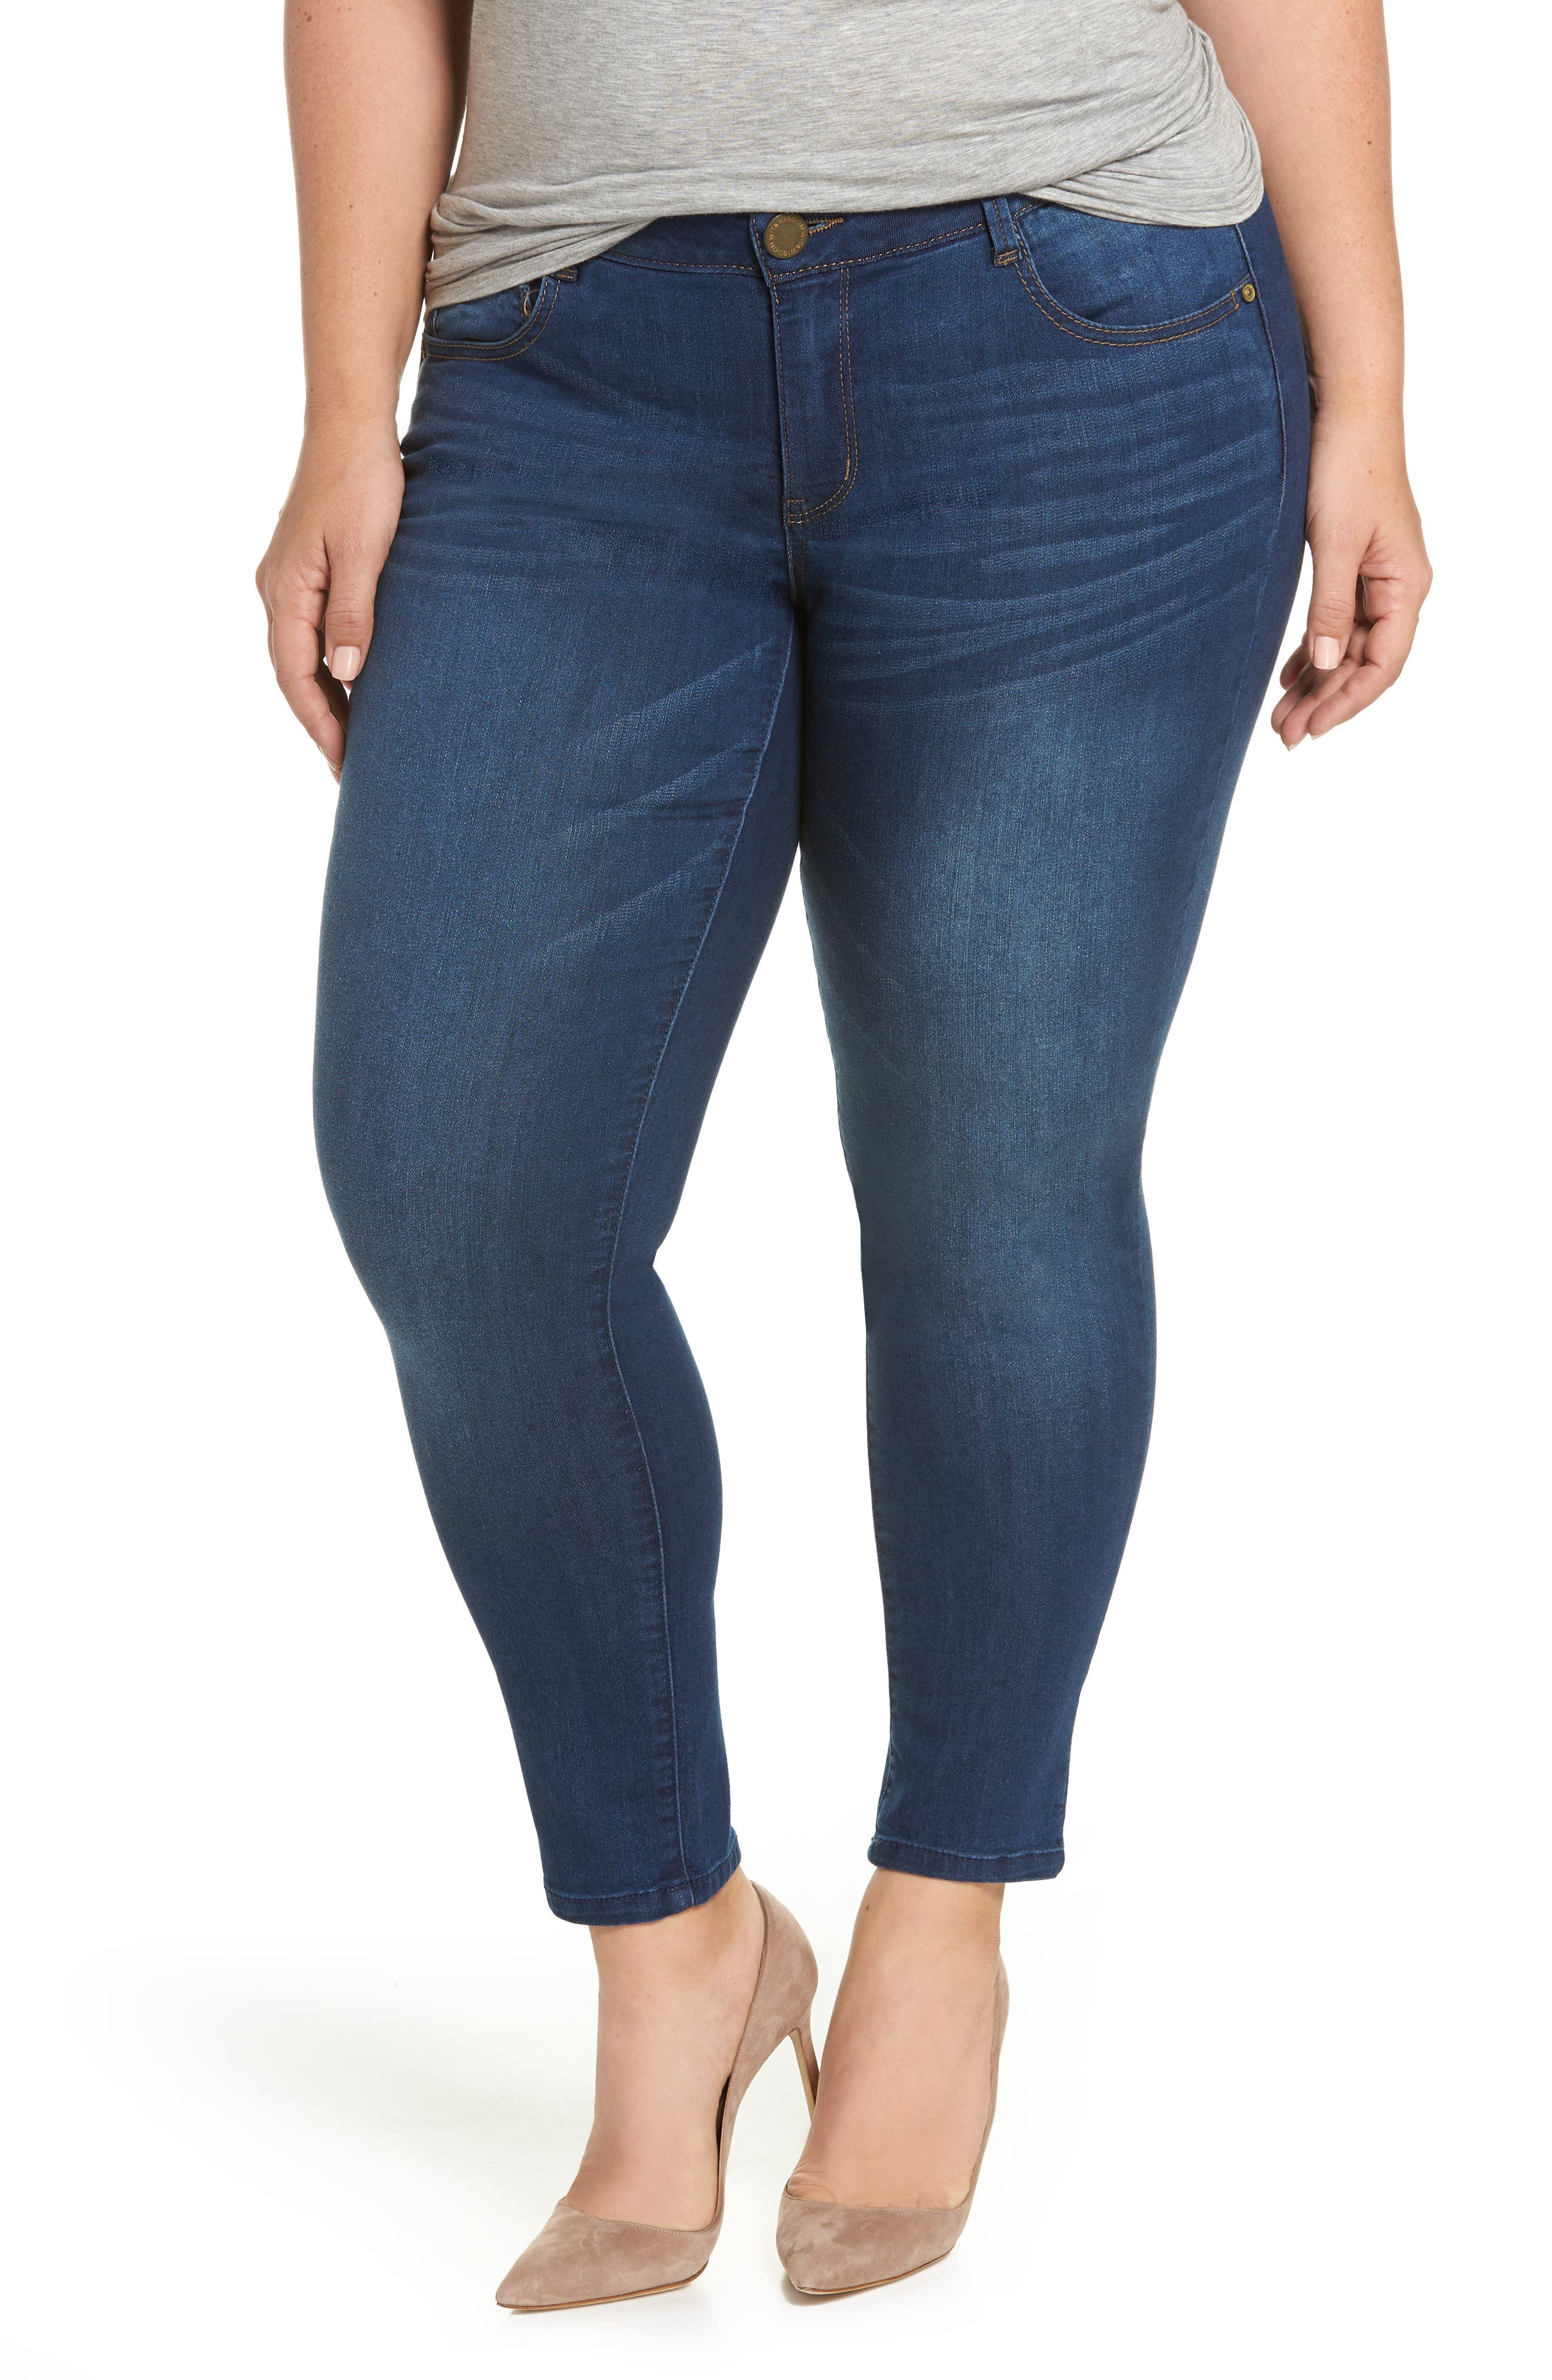 Ab-solution Ankle Skimmer Jeans,                         Main,                         color, Blue